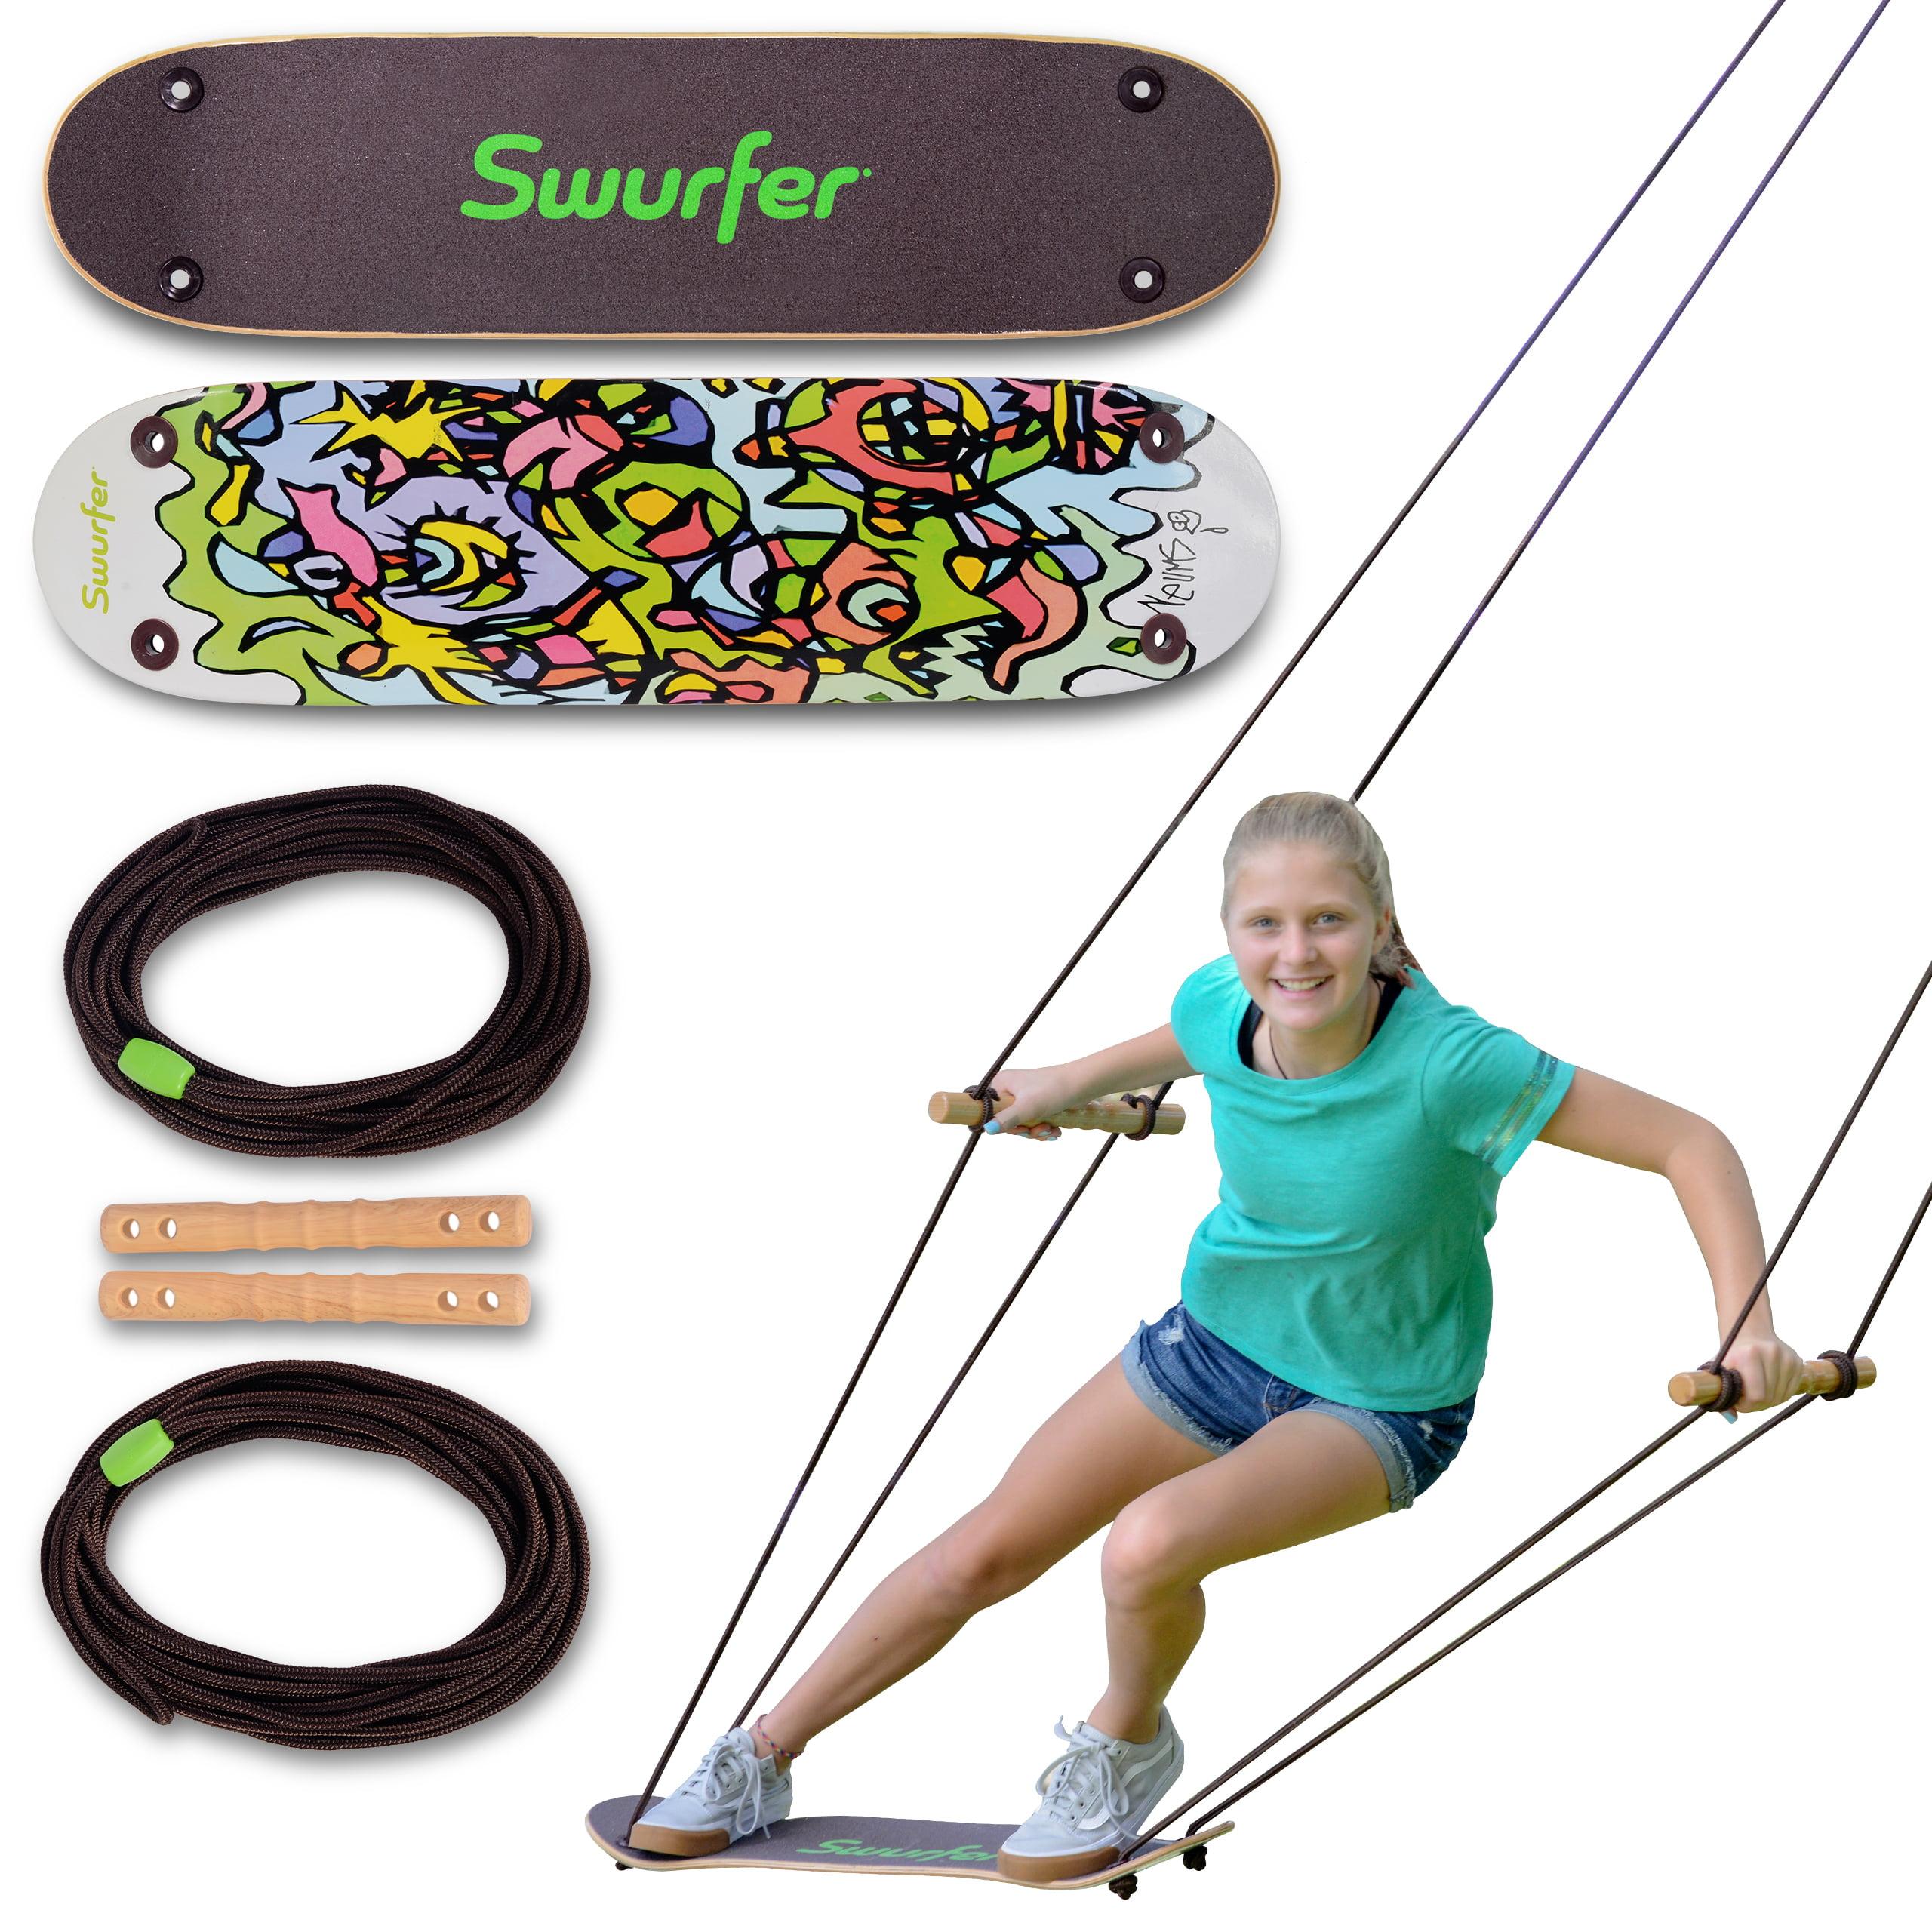 Swurfer Treeskate Undawadda Stand Up Skating Swing, Wooden ...